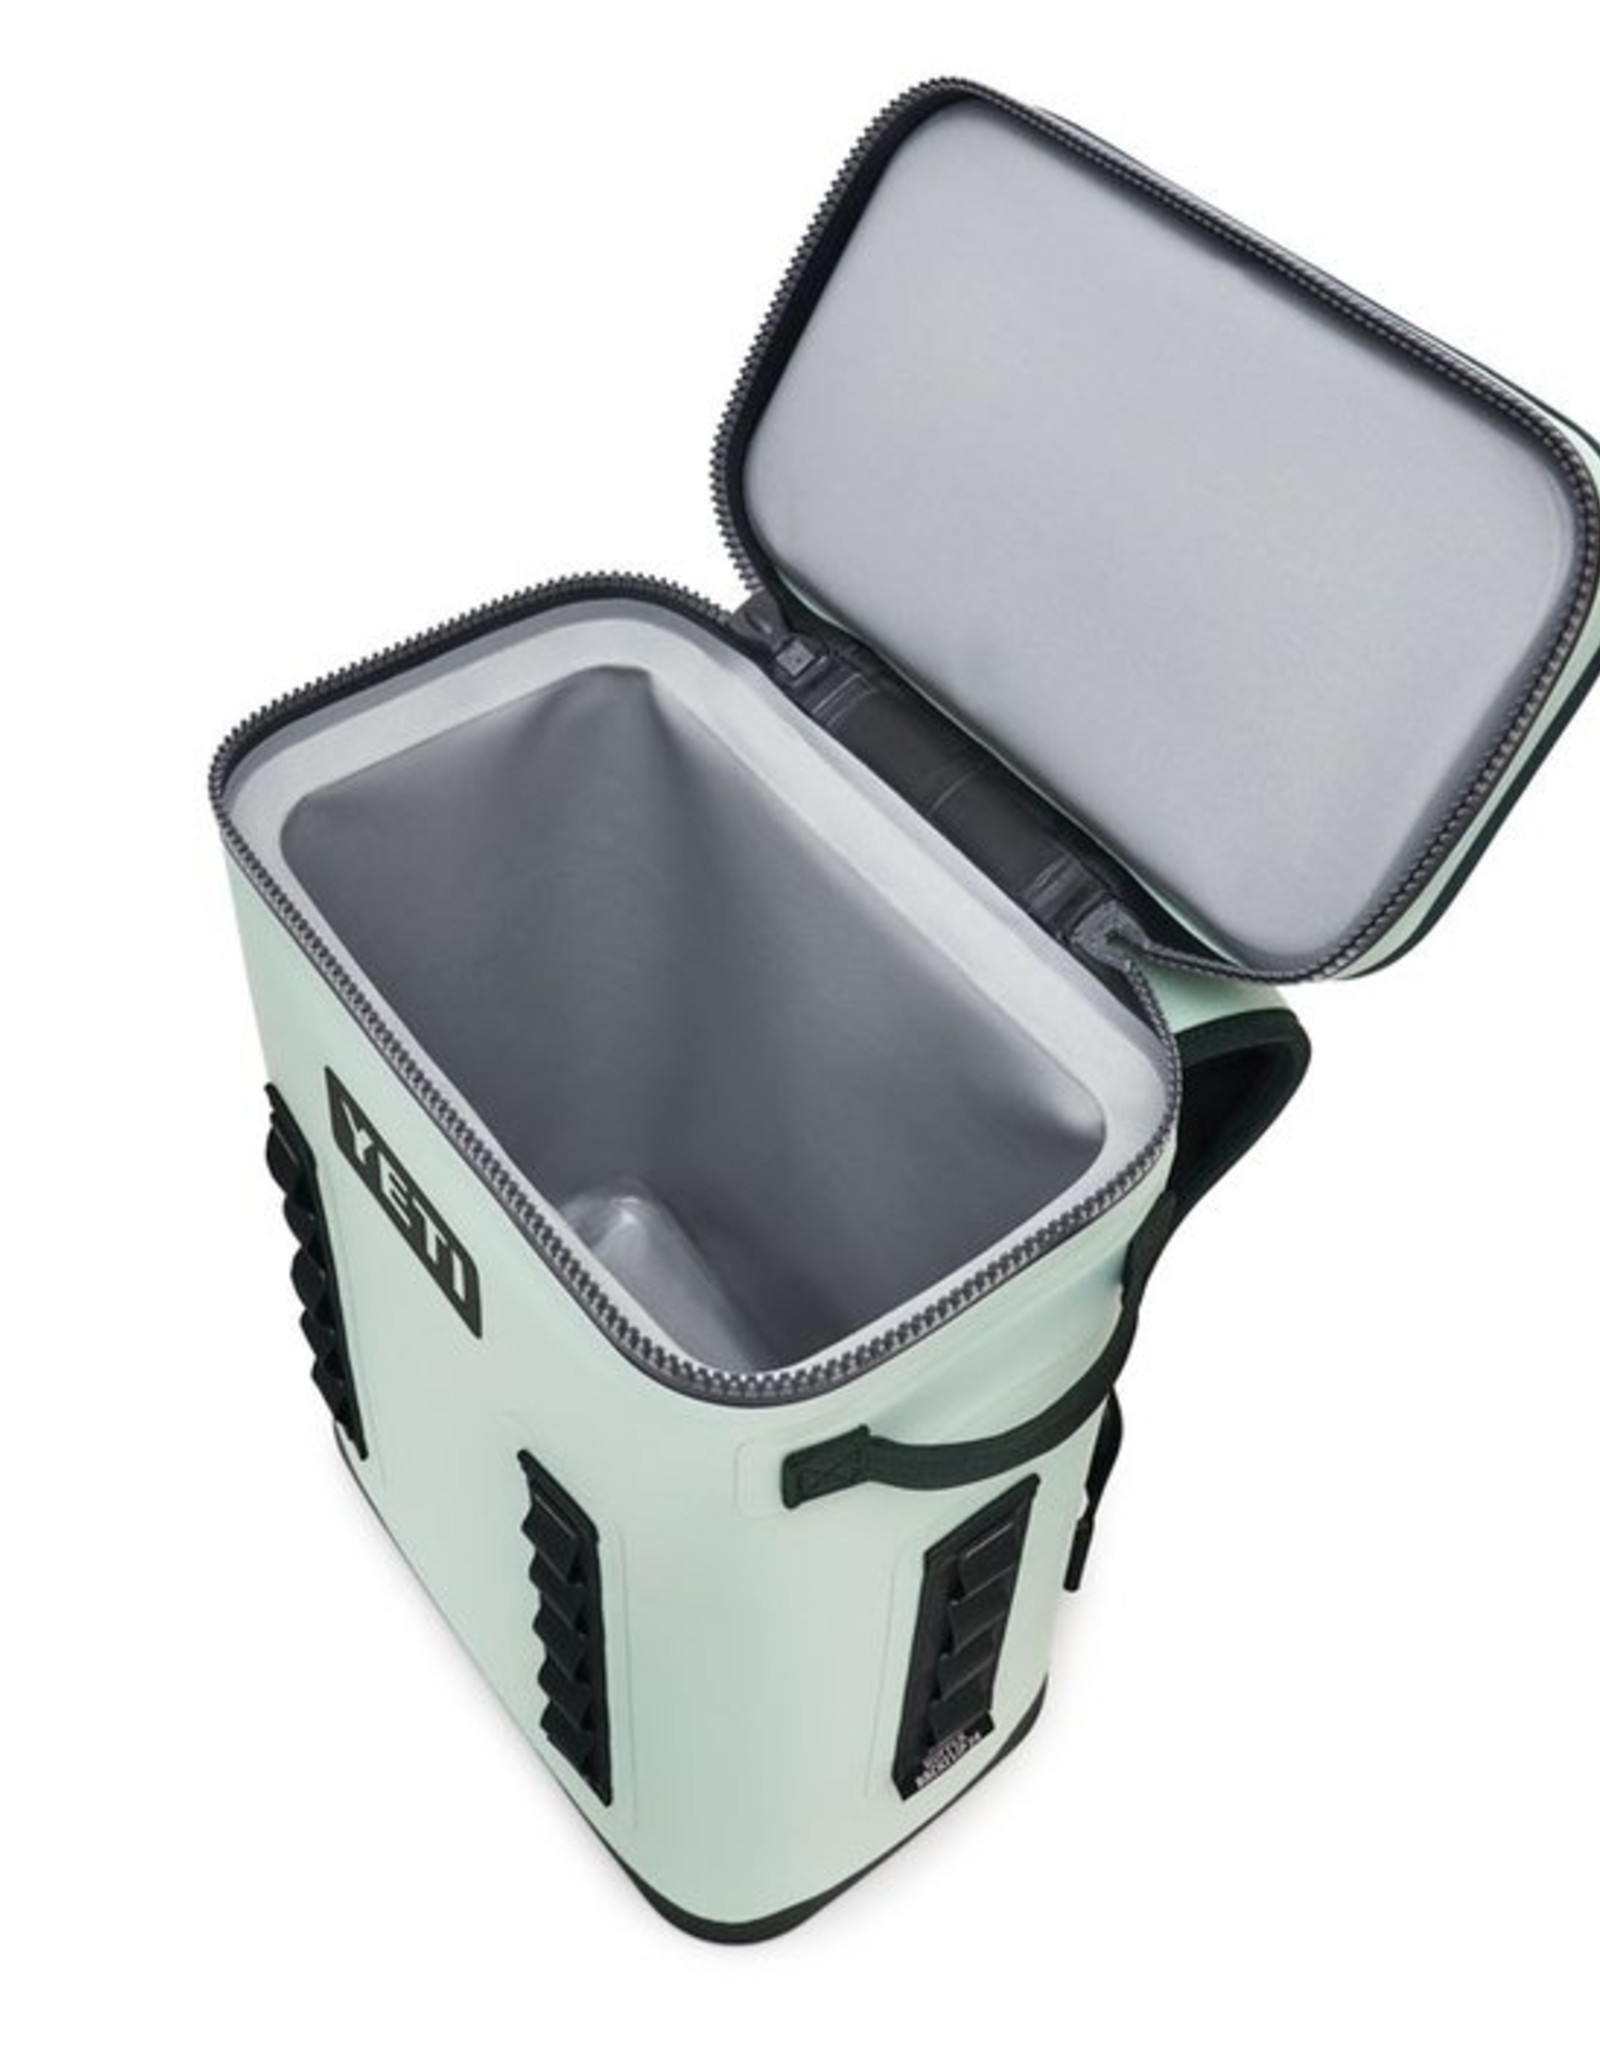 YETI Coolers Hopper 24 Backflip Sagebrush Green